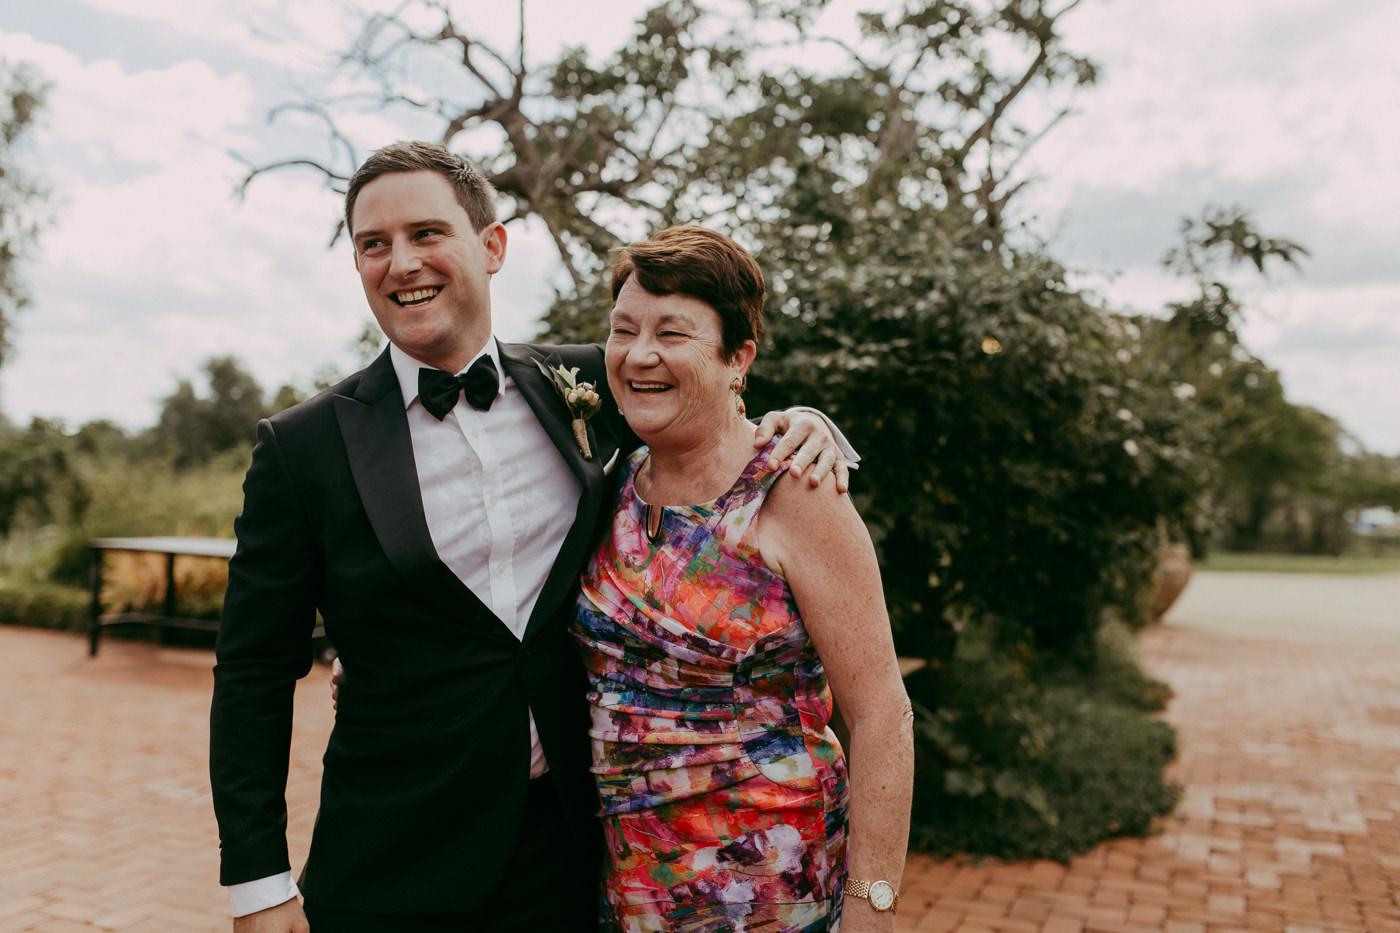 Anthony & Eliet - Wagga Wagga Wedding - Country NSW - Samantha Heather Photography-91.jpg